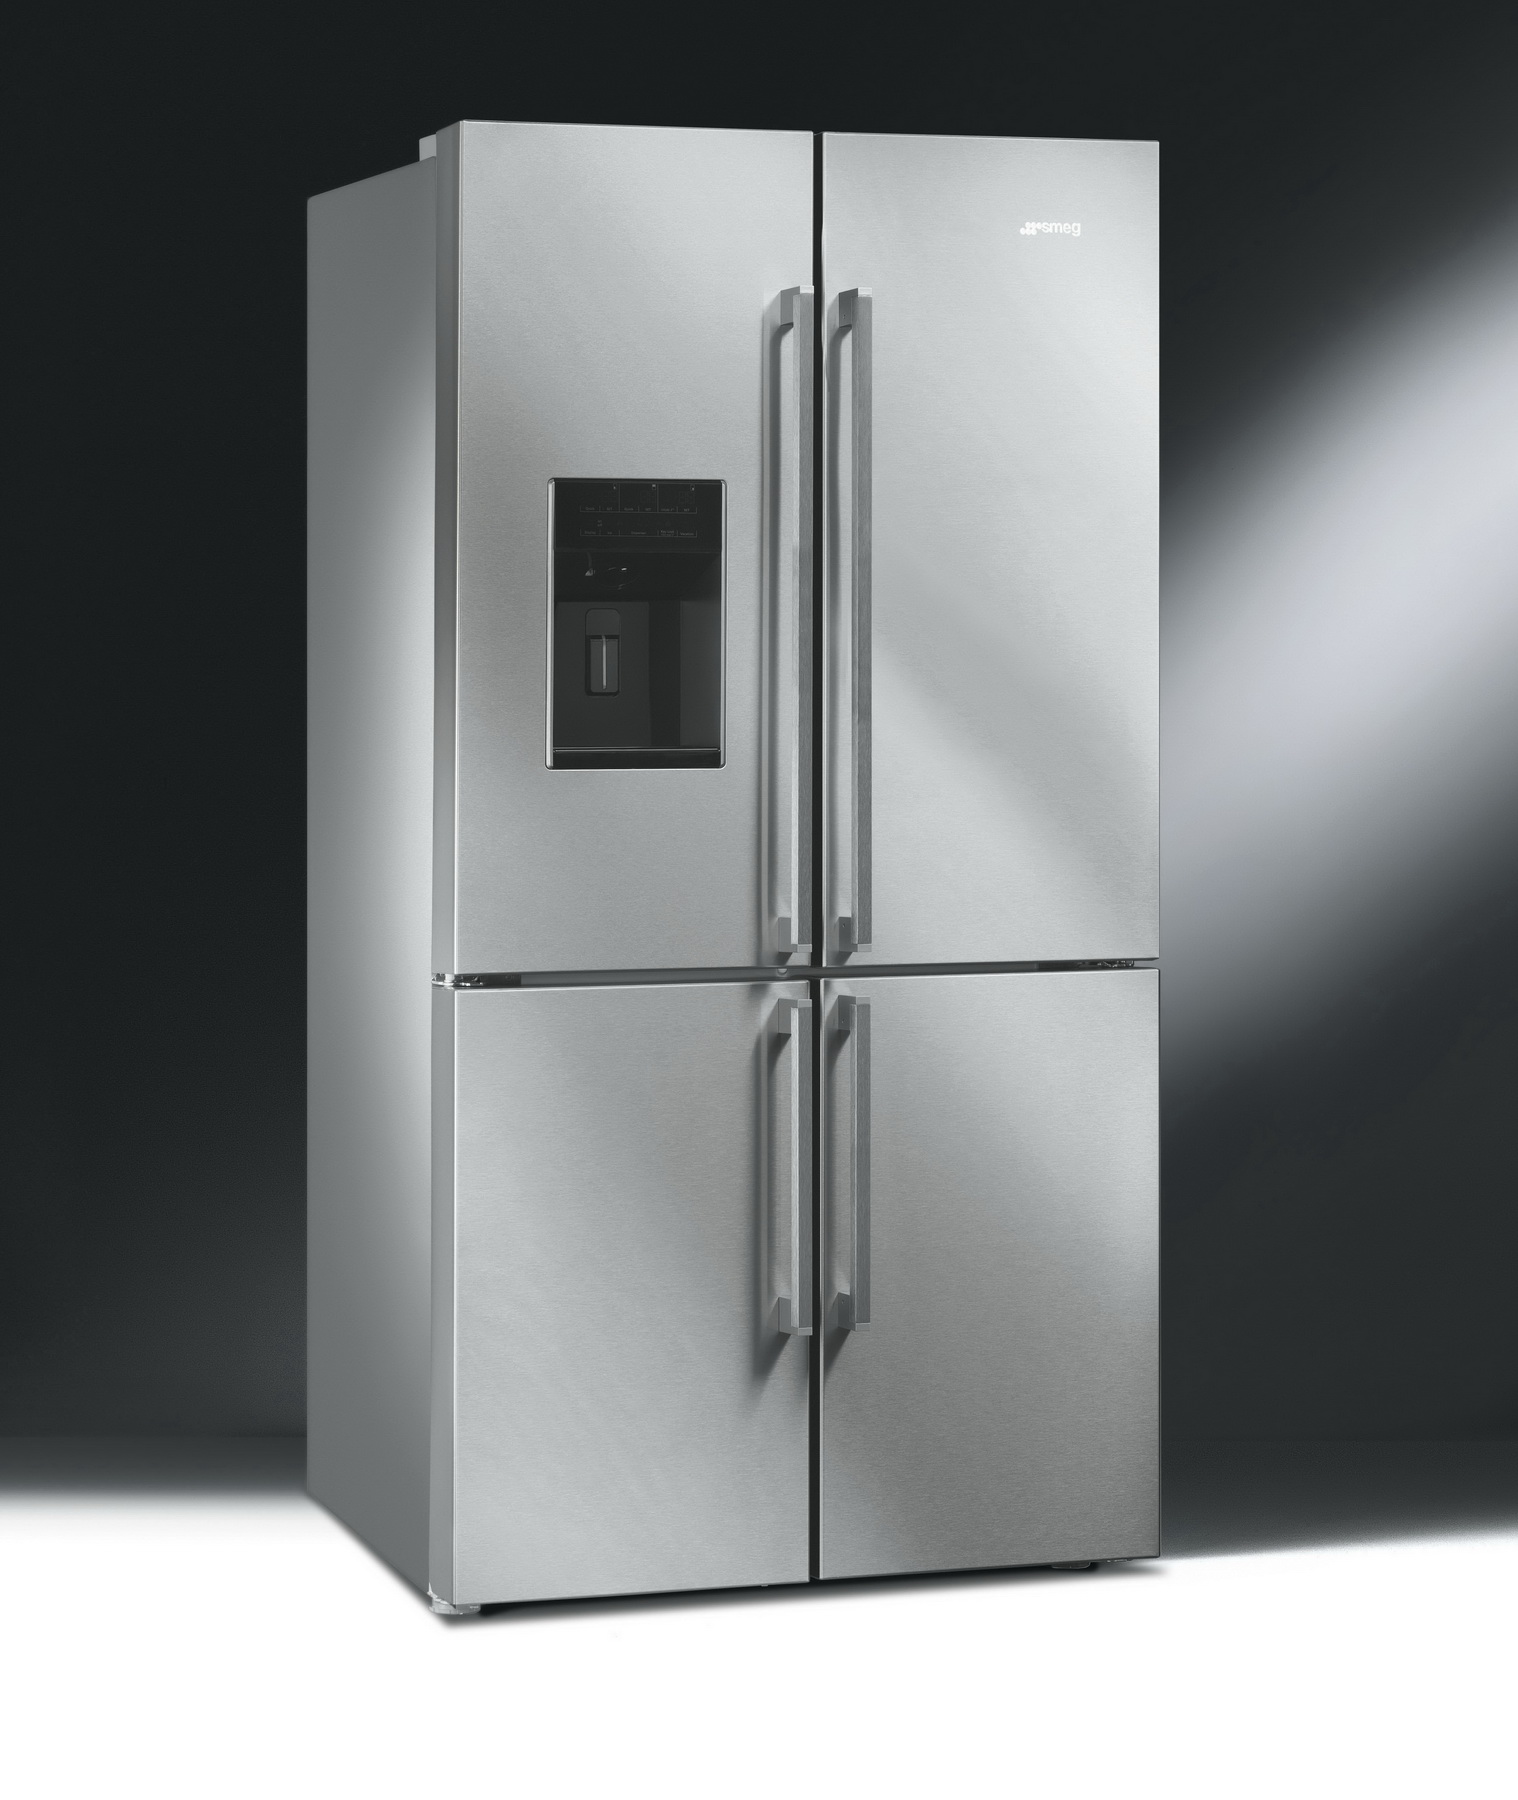 smeg fq75xped french door k hlschrank mit eismaschine 91 cm breite. Black Bedroom Furniture Sets. Home Design Ideas